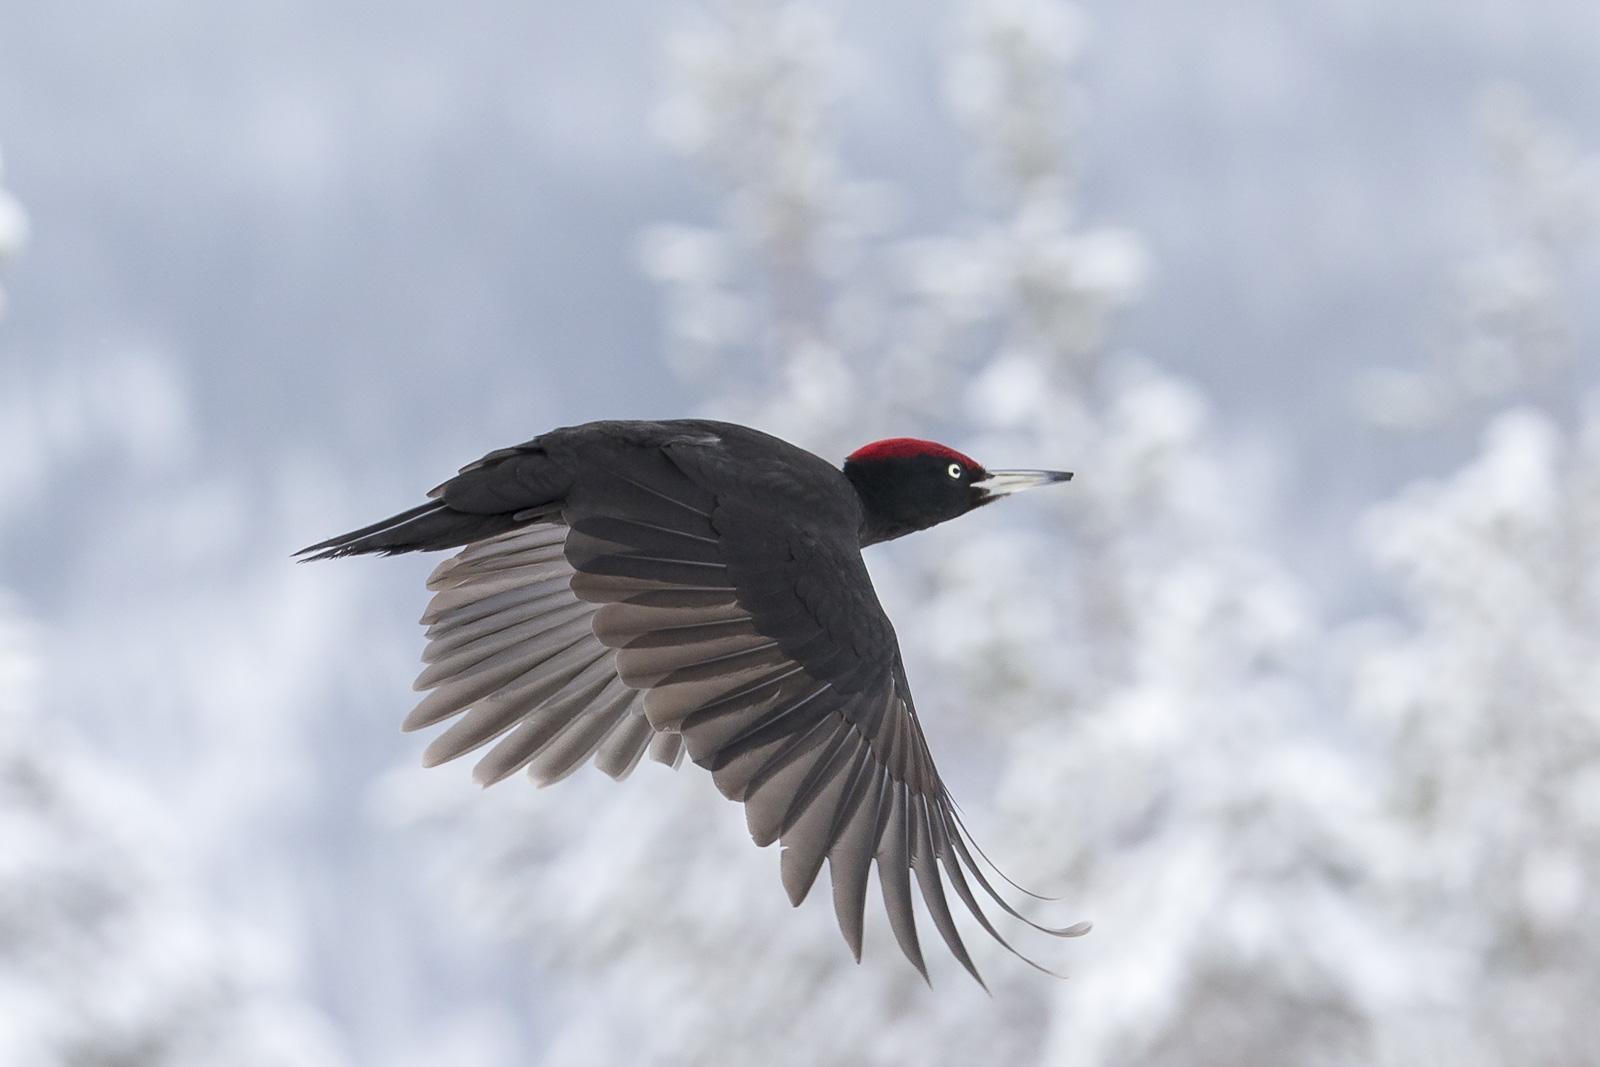 Picus Martius or black woodpecker   Image source: http://finnature.com/birds/bird-photography/woodpeckers/black-woodpecker/